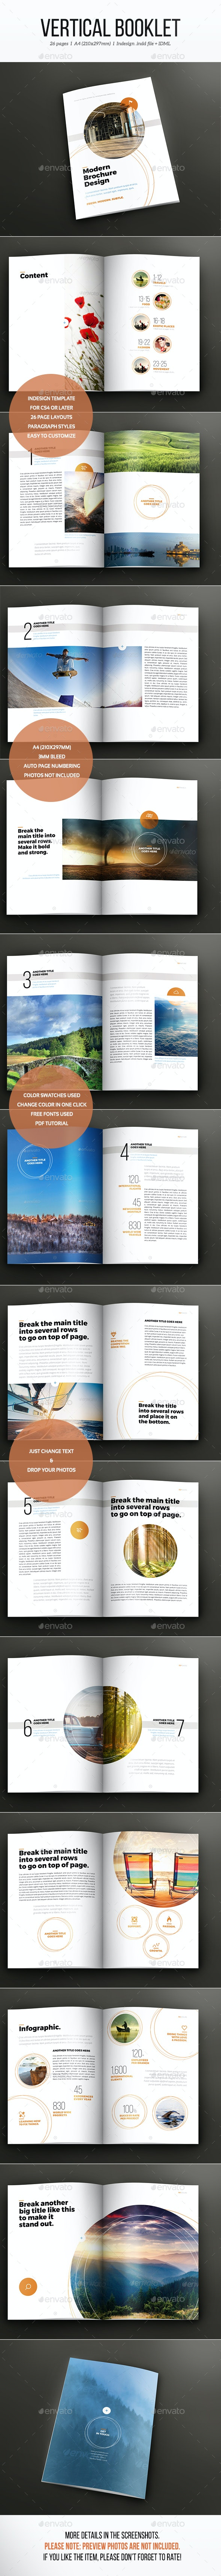 Vertical Booklet - Informational Brochures